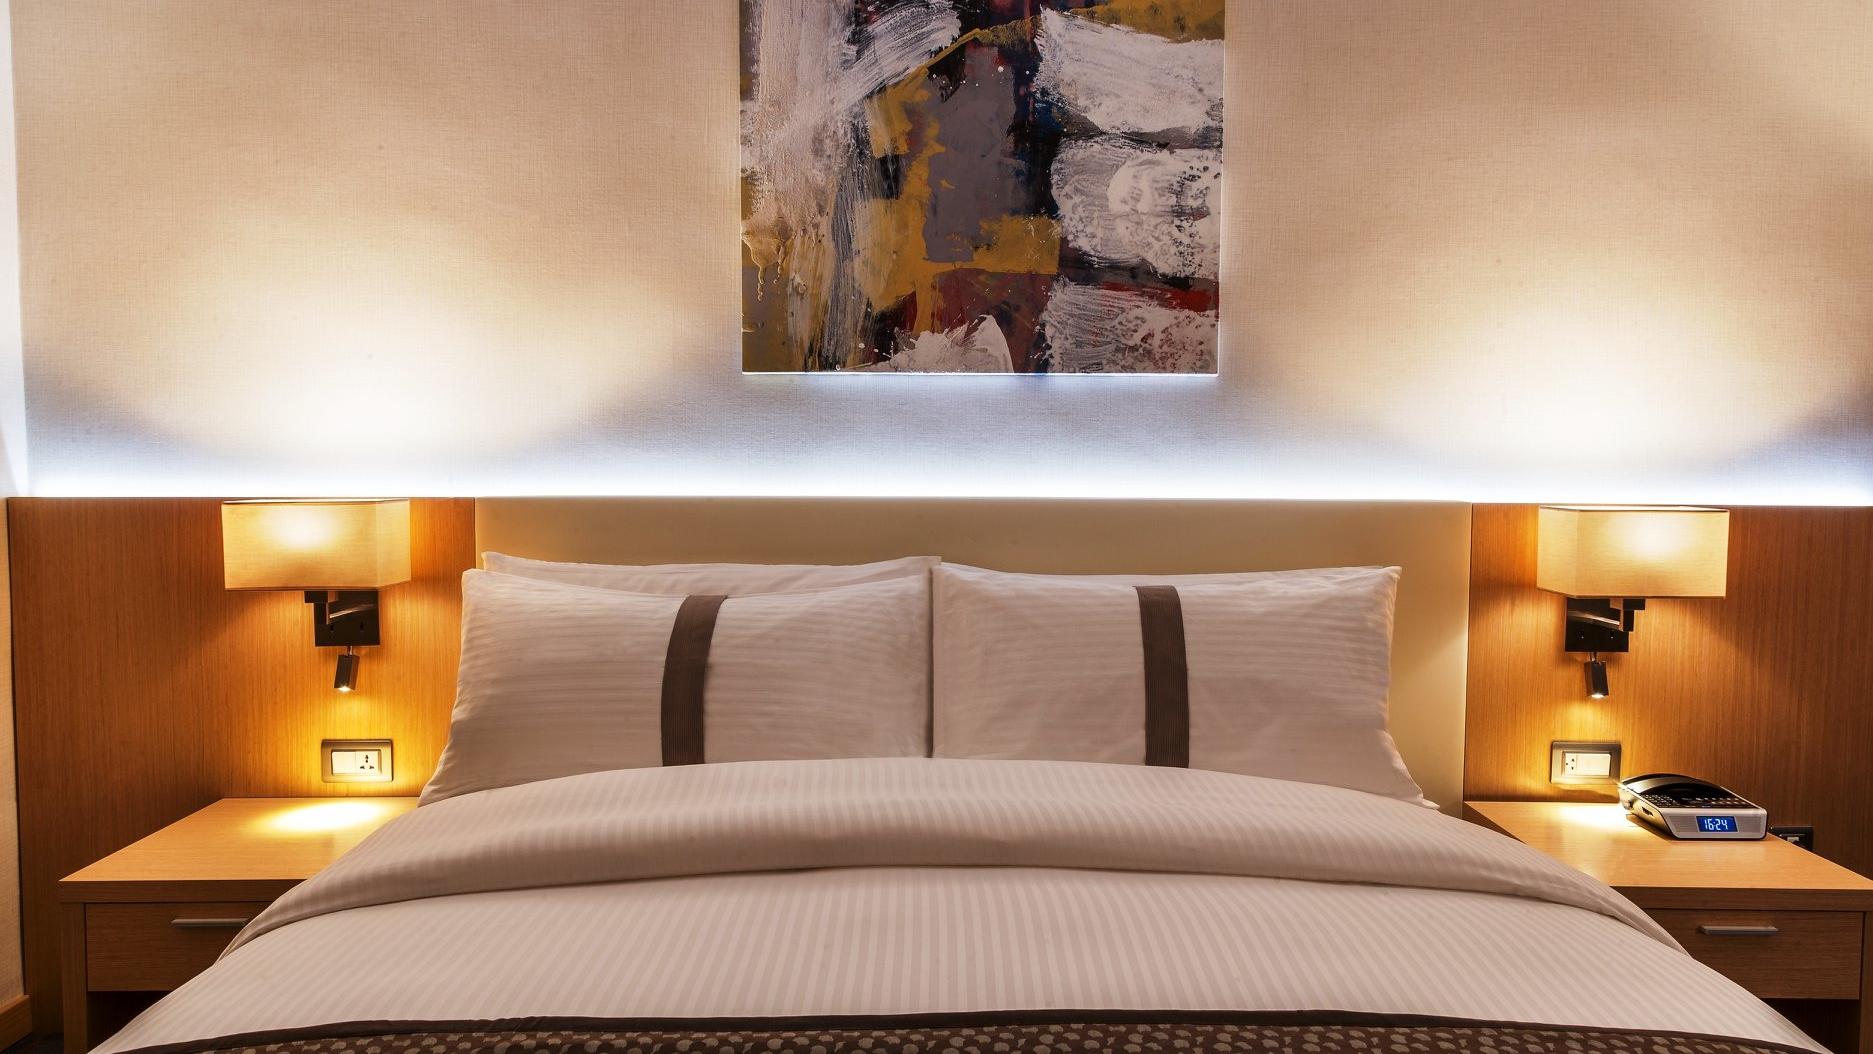 Best Family Hotels in Jordan Holiday Inn Amman